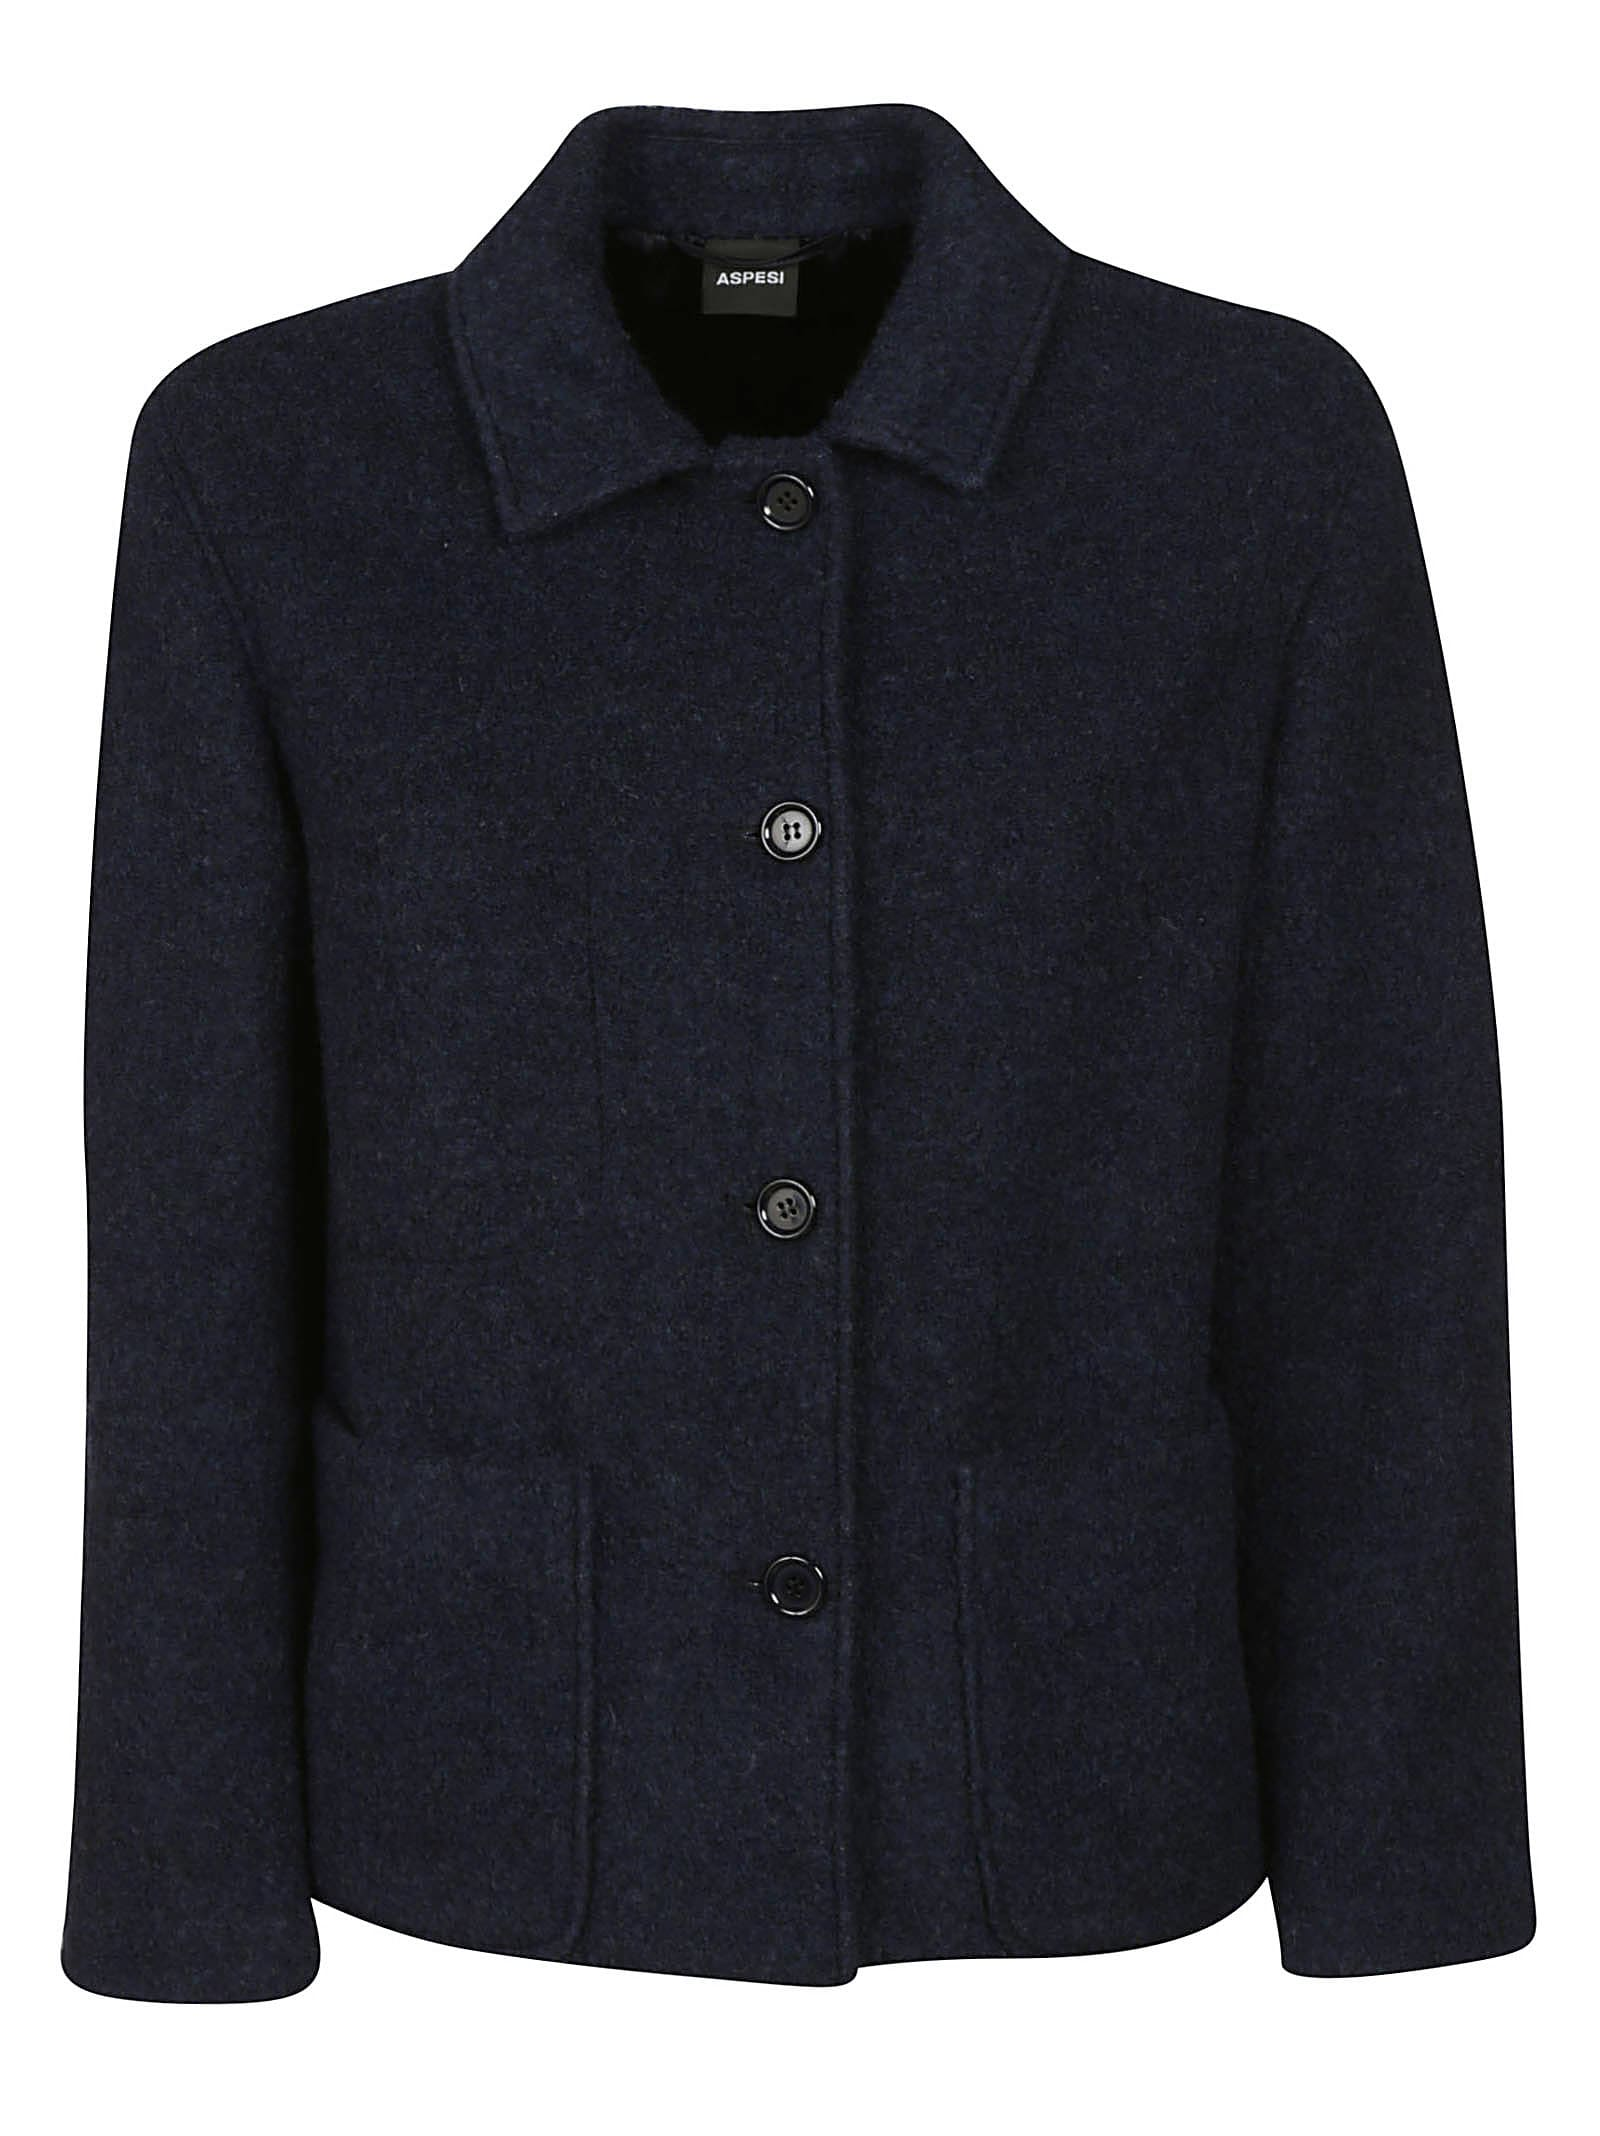 Aspesi Side Patch Buttoned Jacket